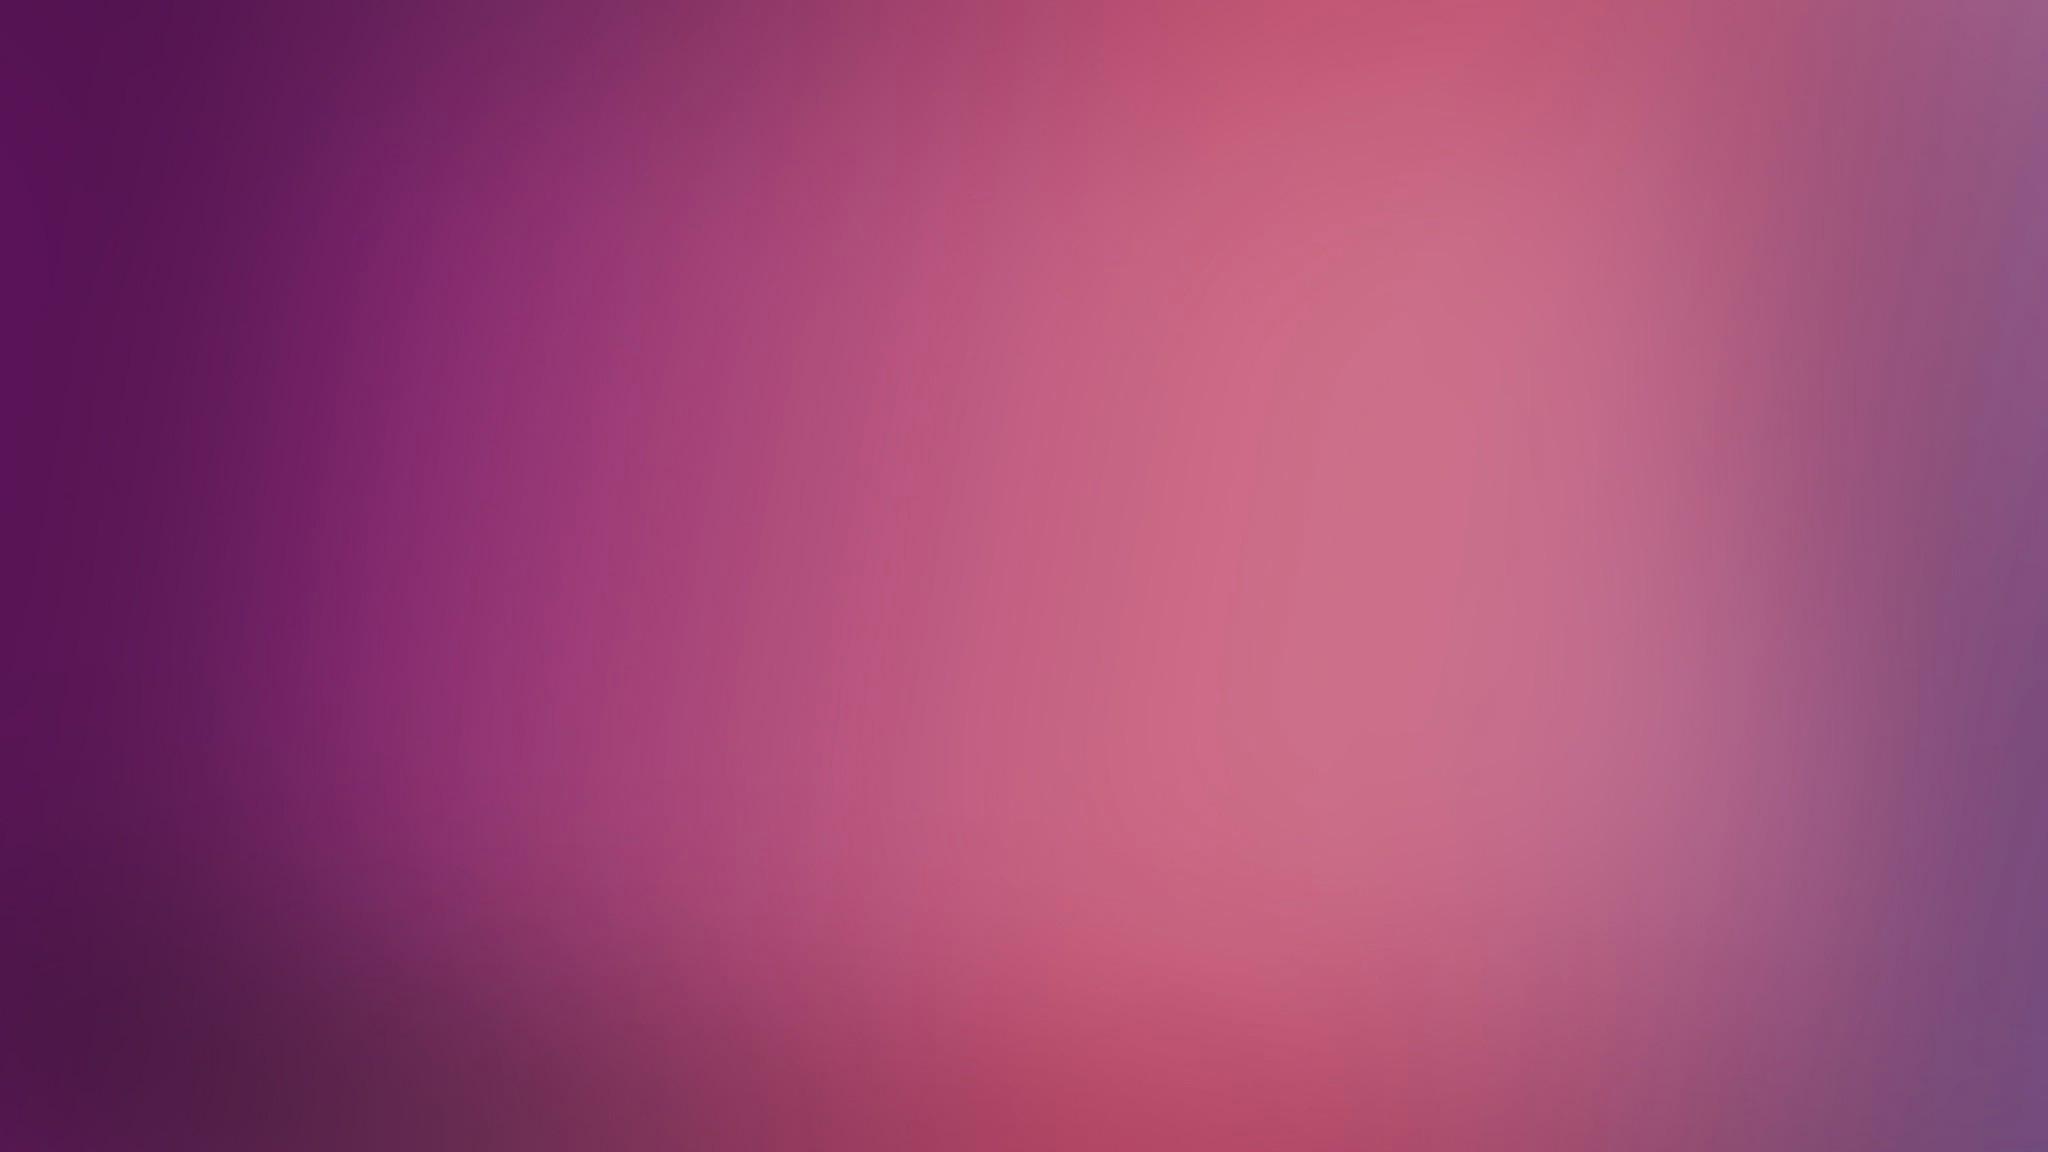 Solid-Color-HD-Wallpapers-For-Desktop